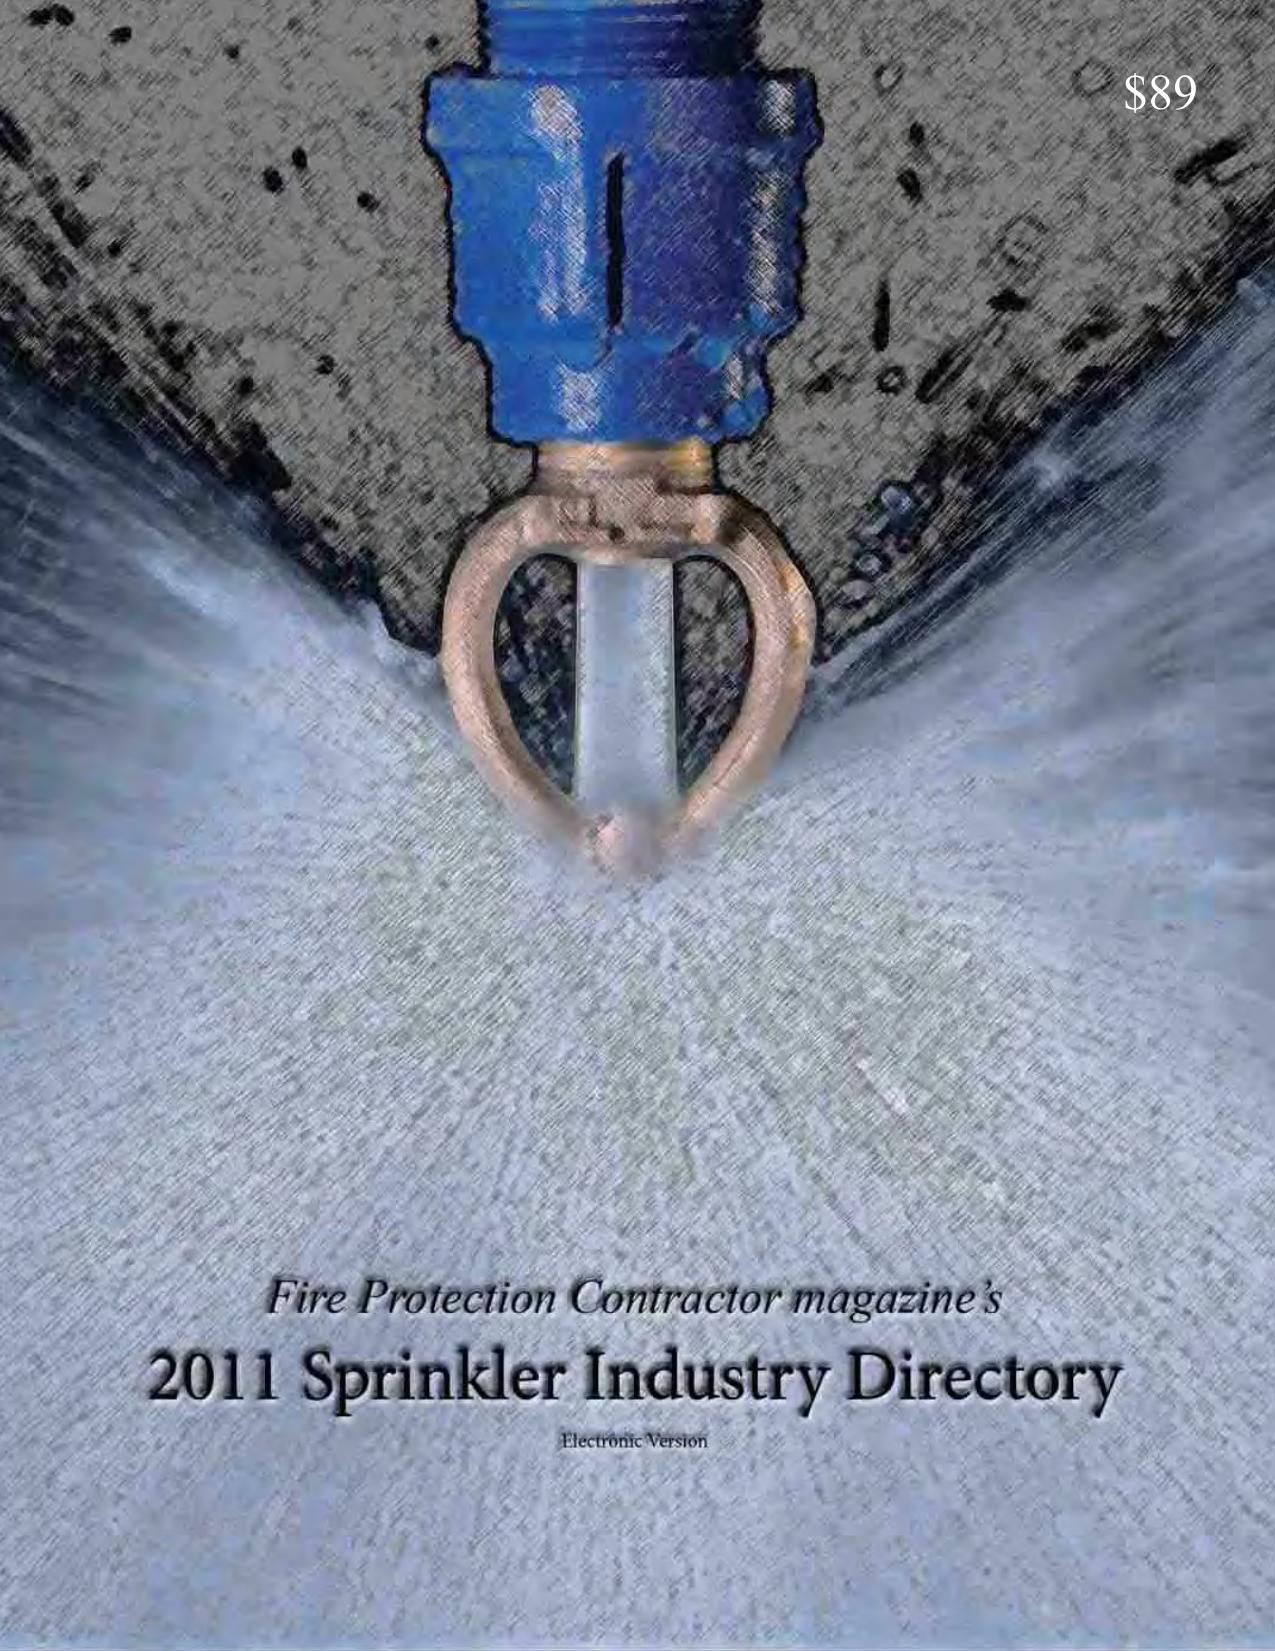 FPC`s 2011 SPRINKLER INDUSTRY DIRECTORY | manualzz com